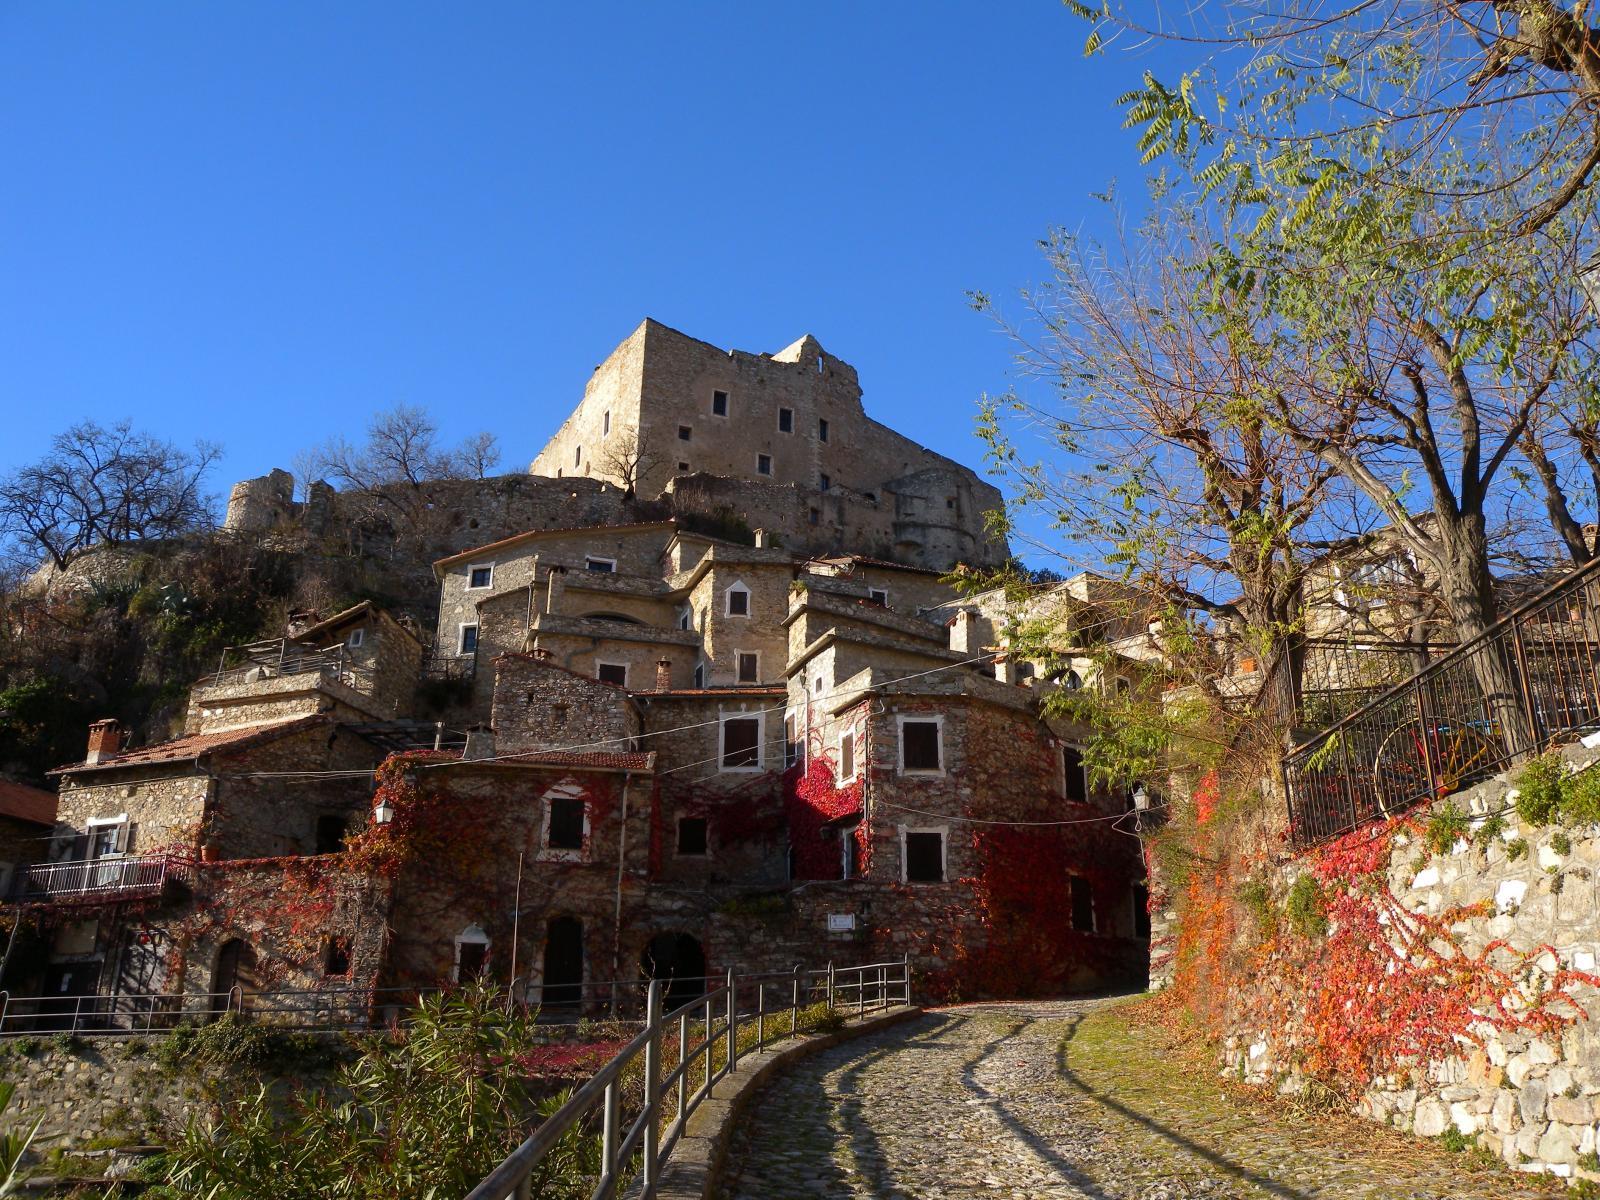 il bel borgo mediovale